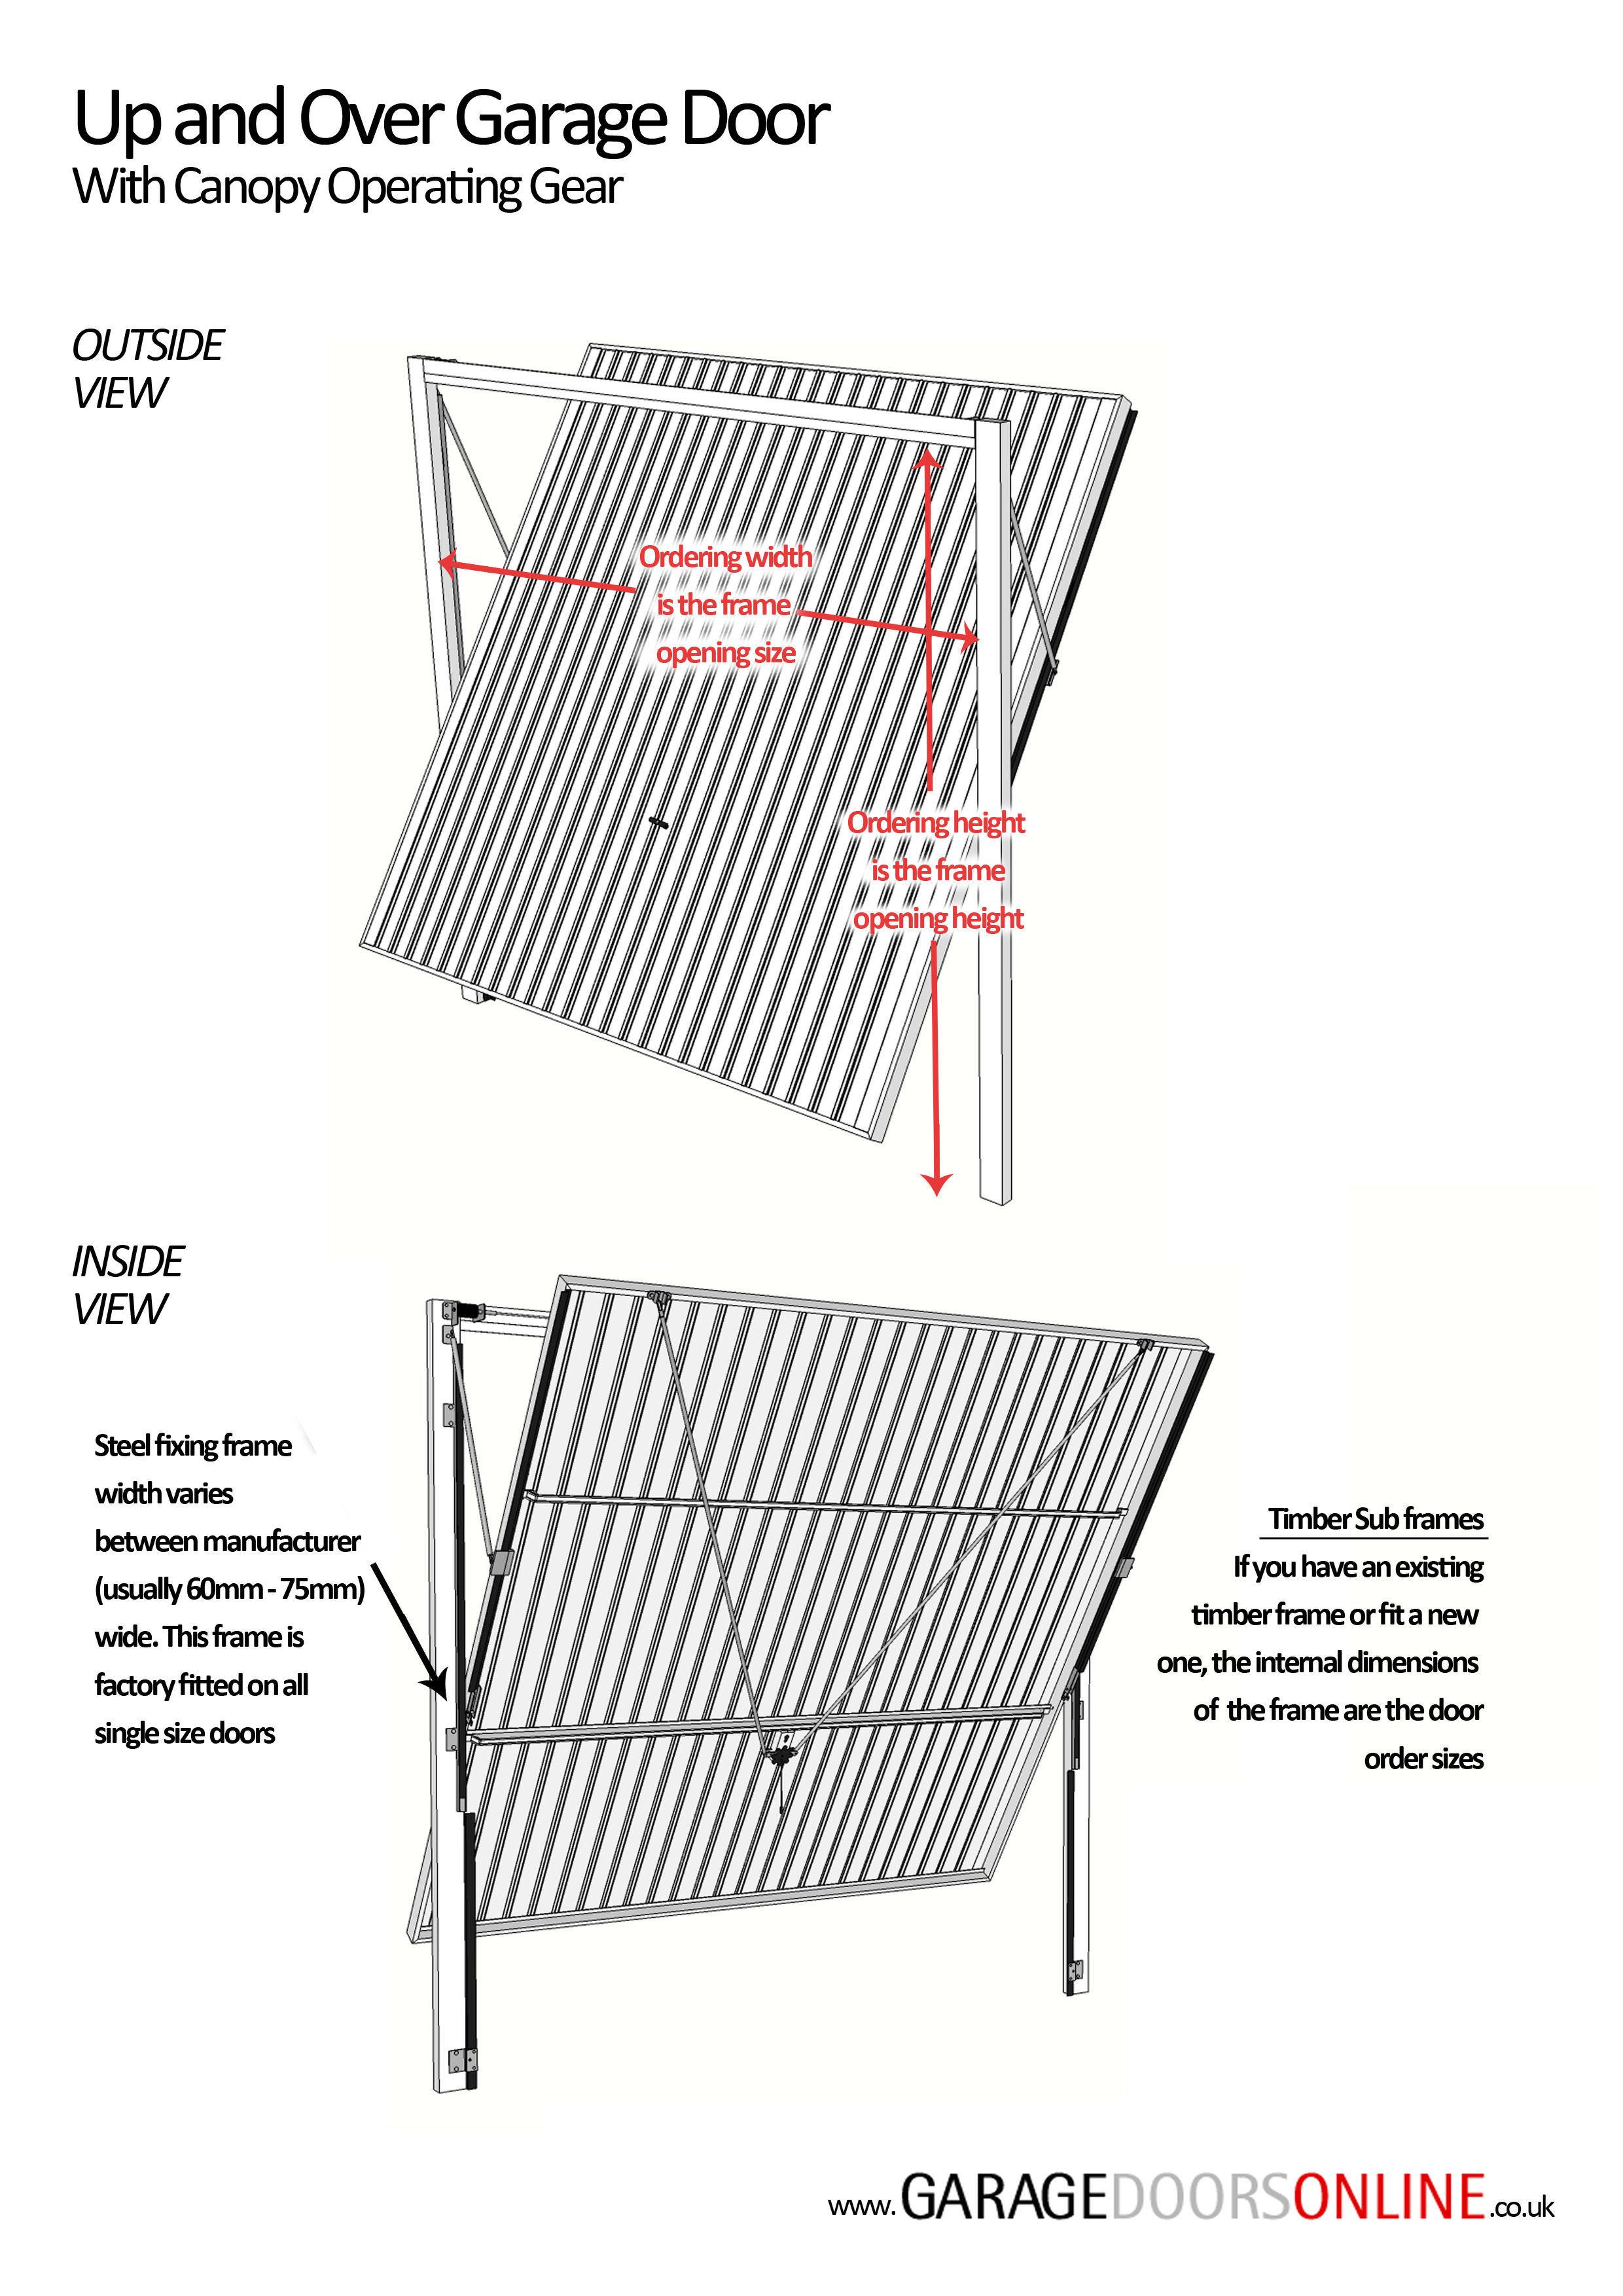 Garador Horizon Standard White Garador Steel Up And Over Canopy